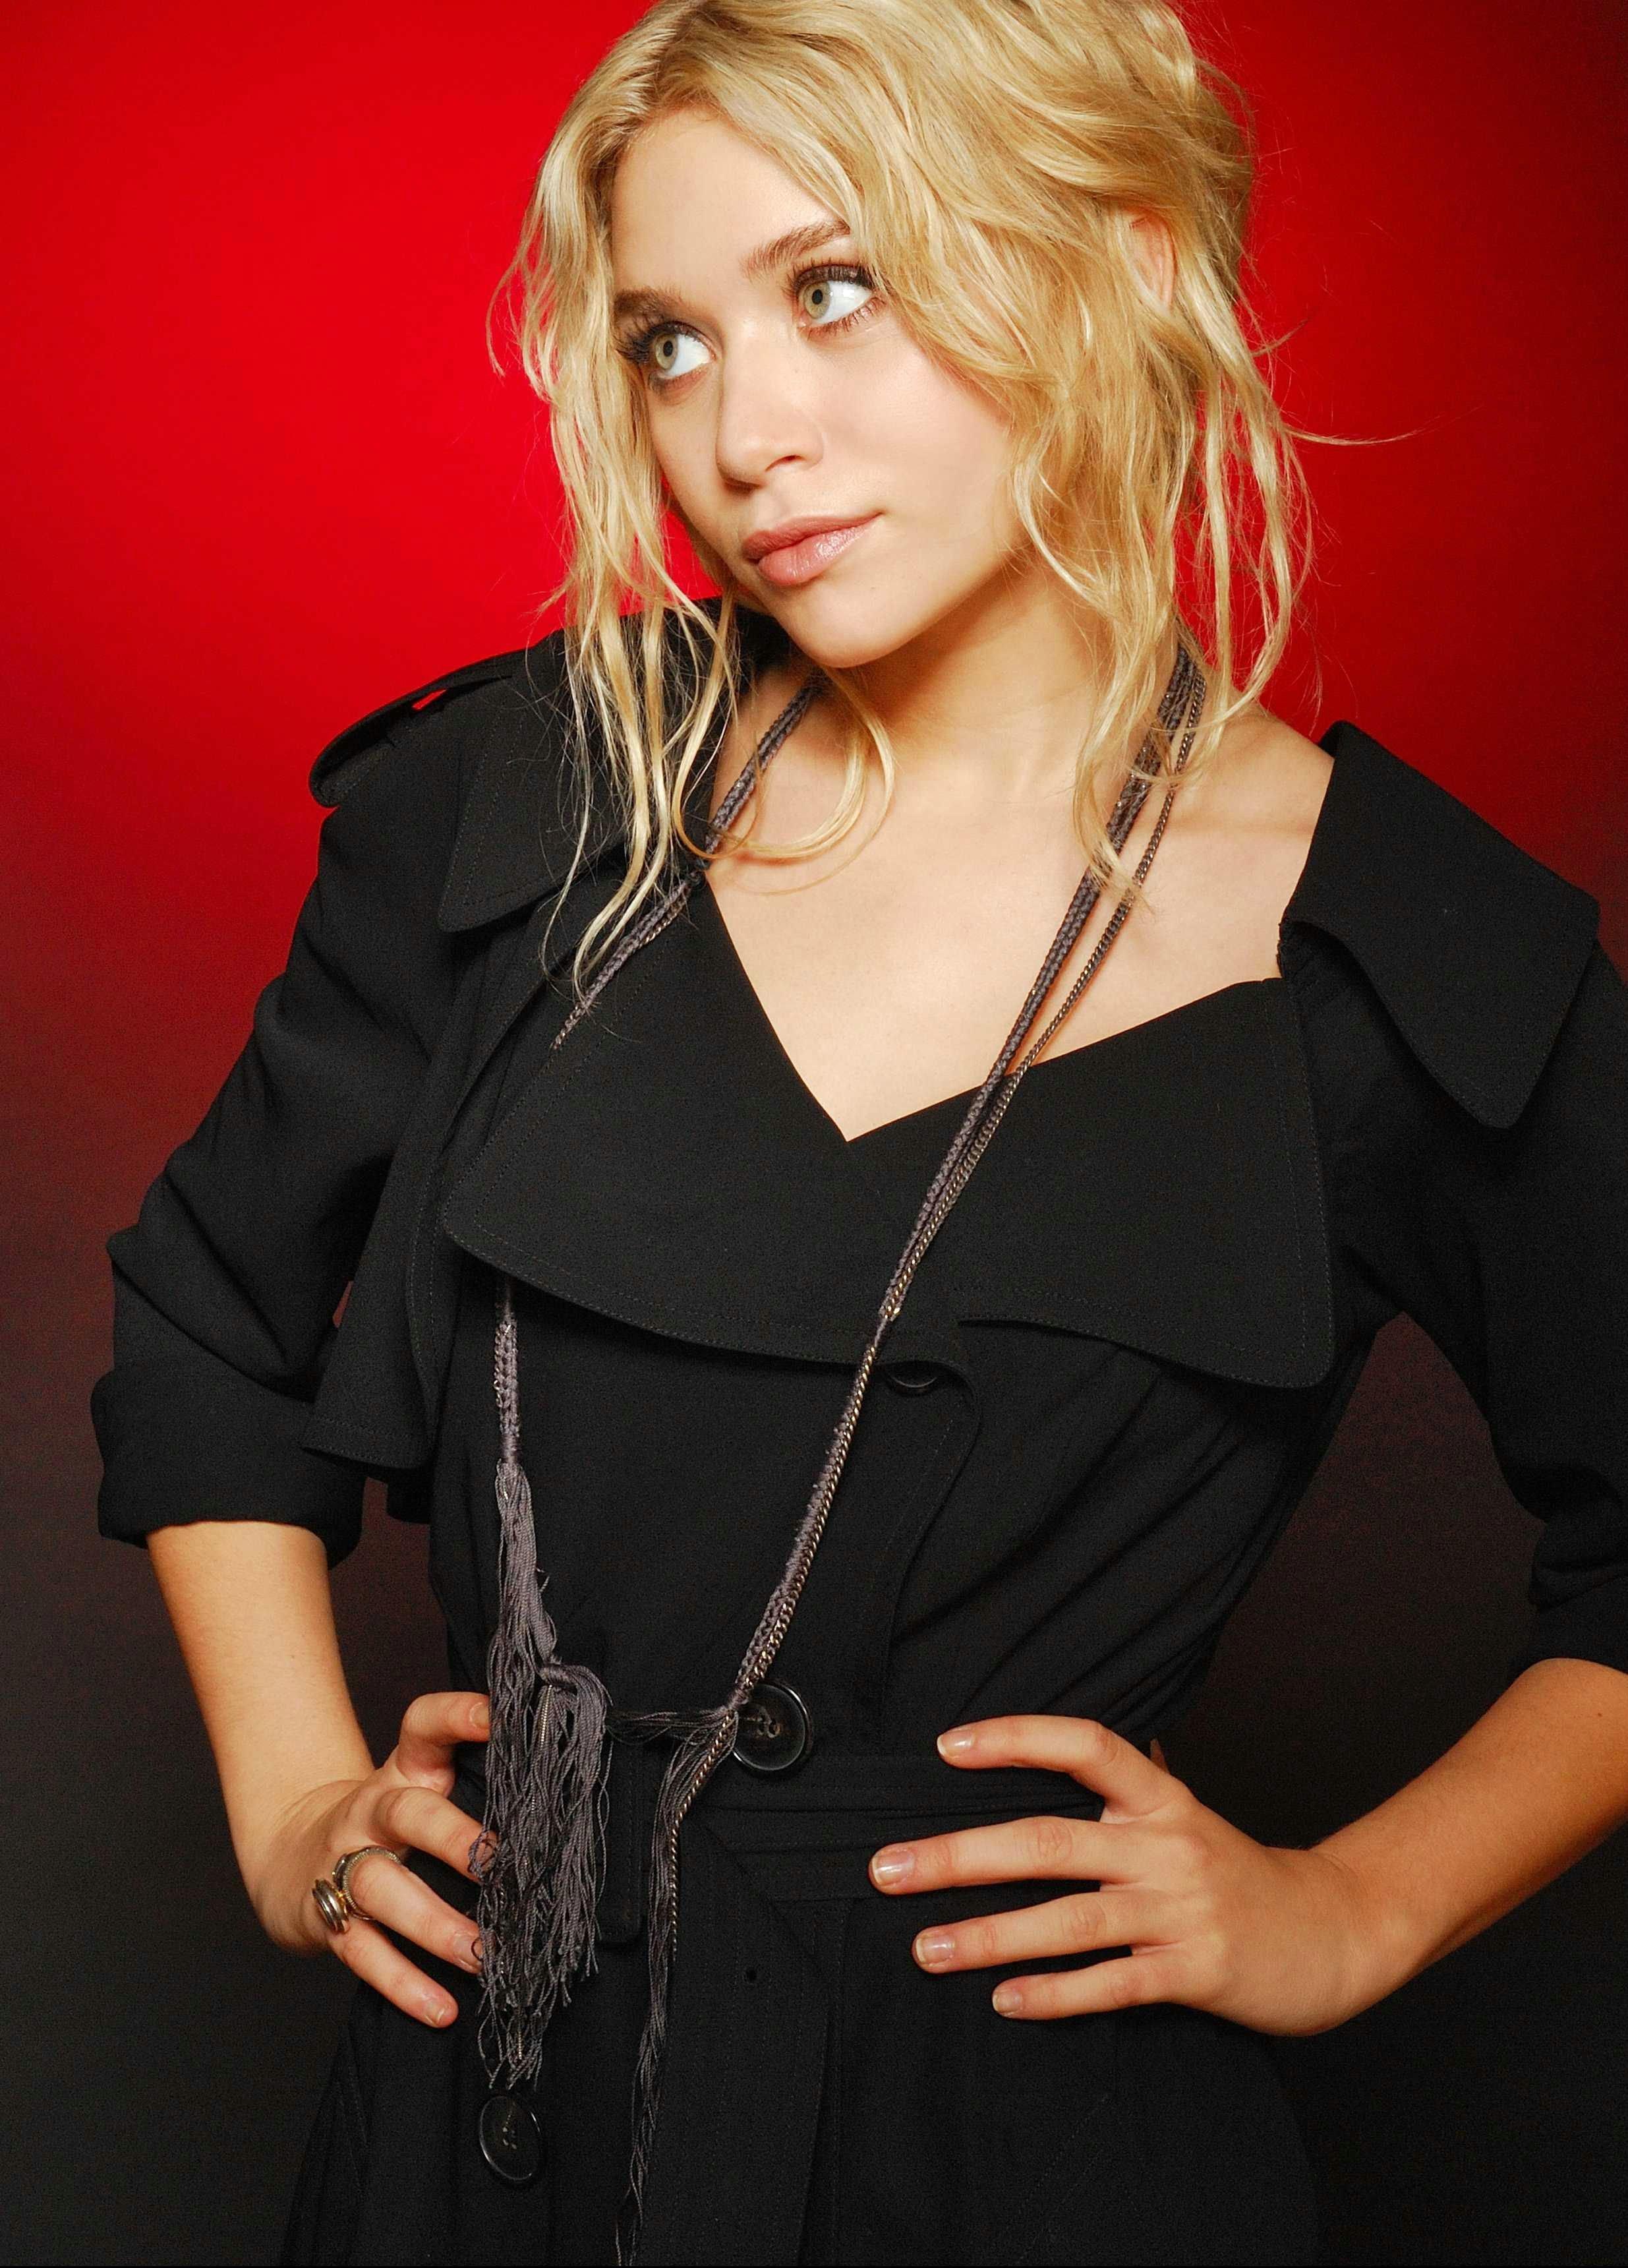 Ashley Olsen HD